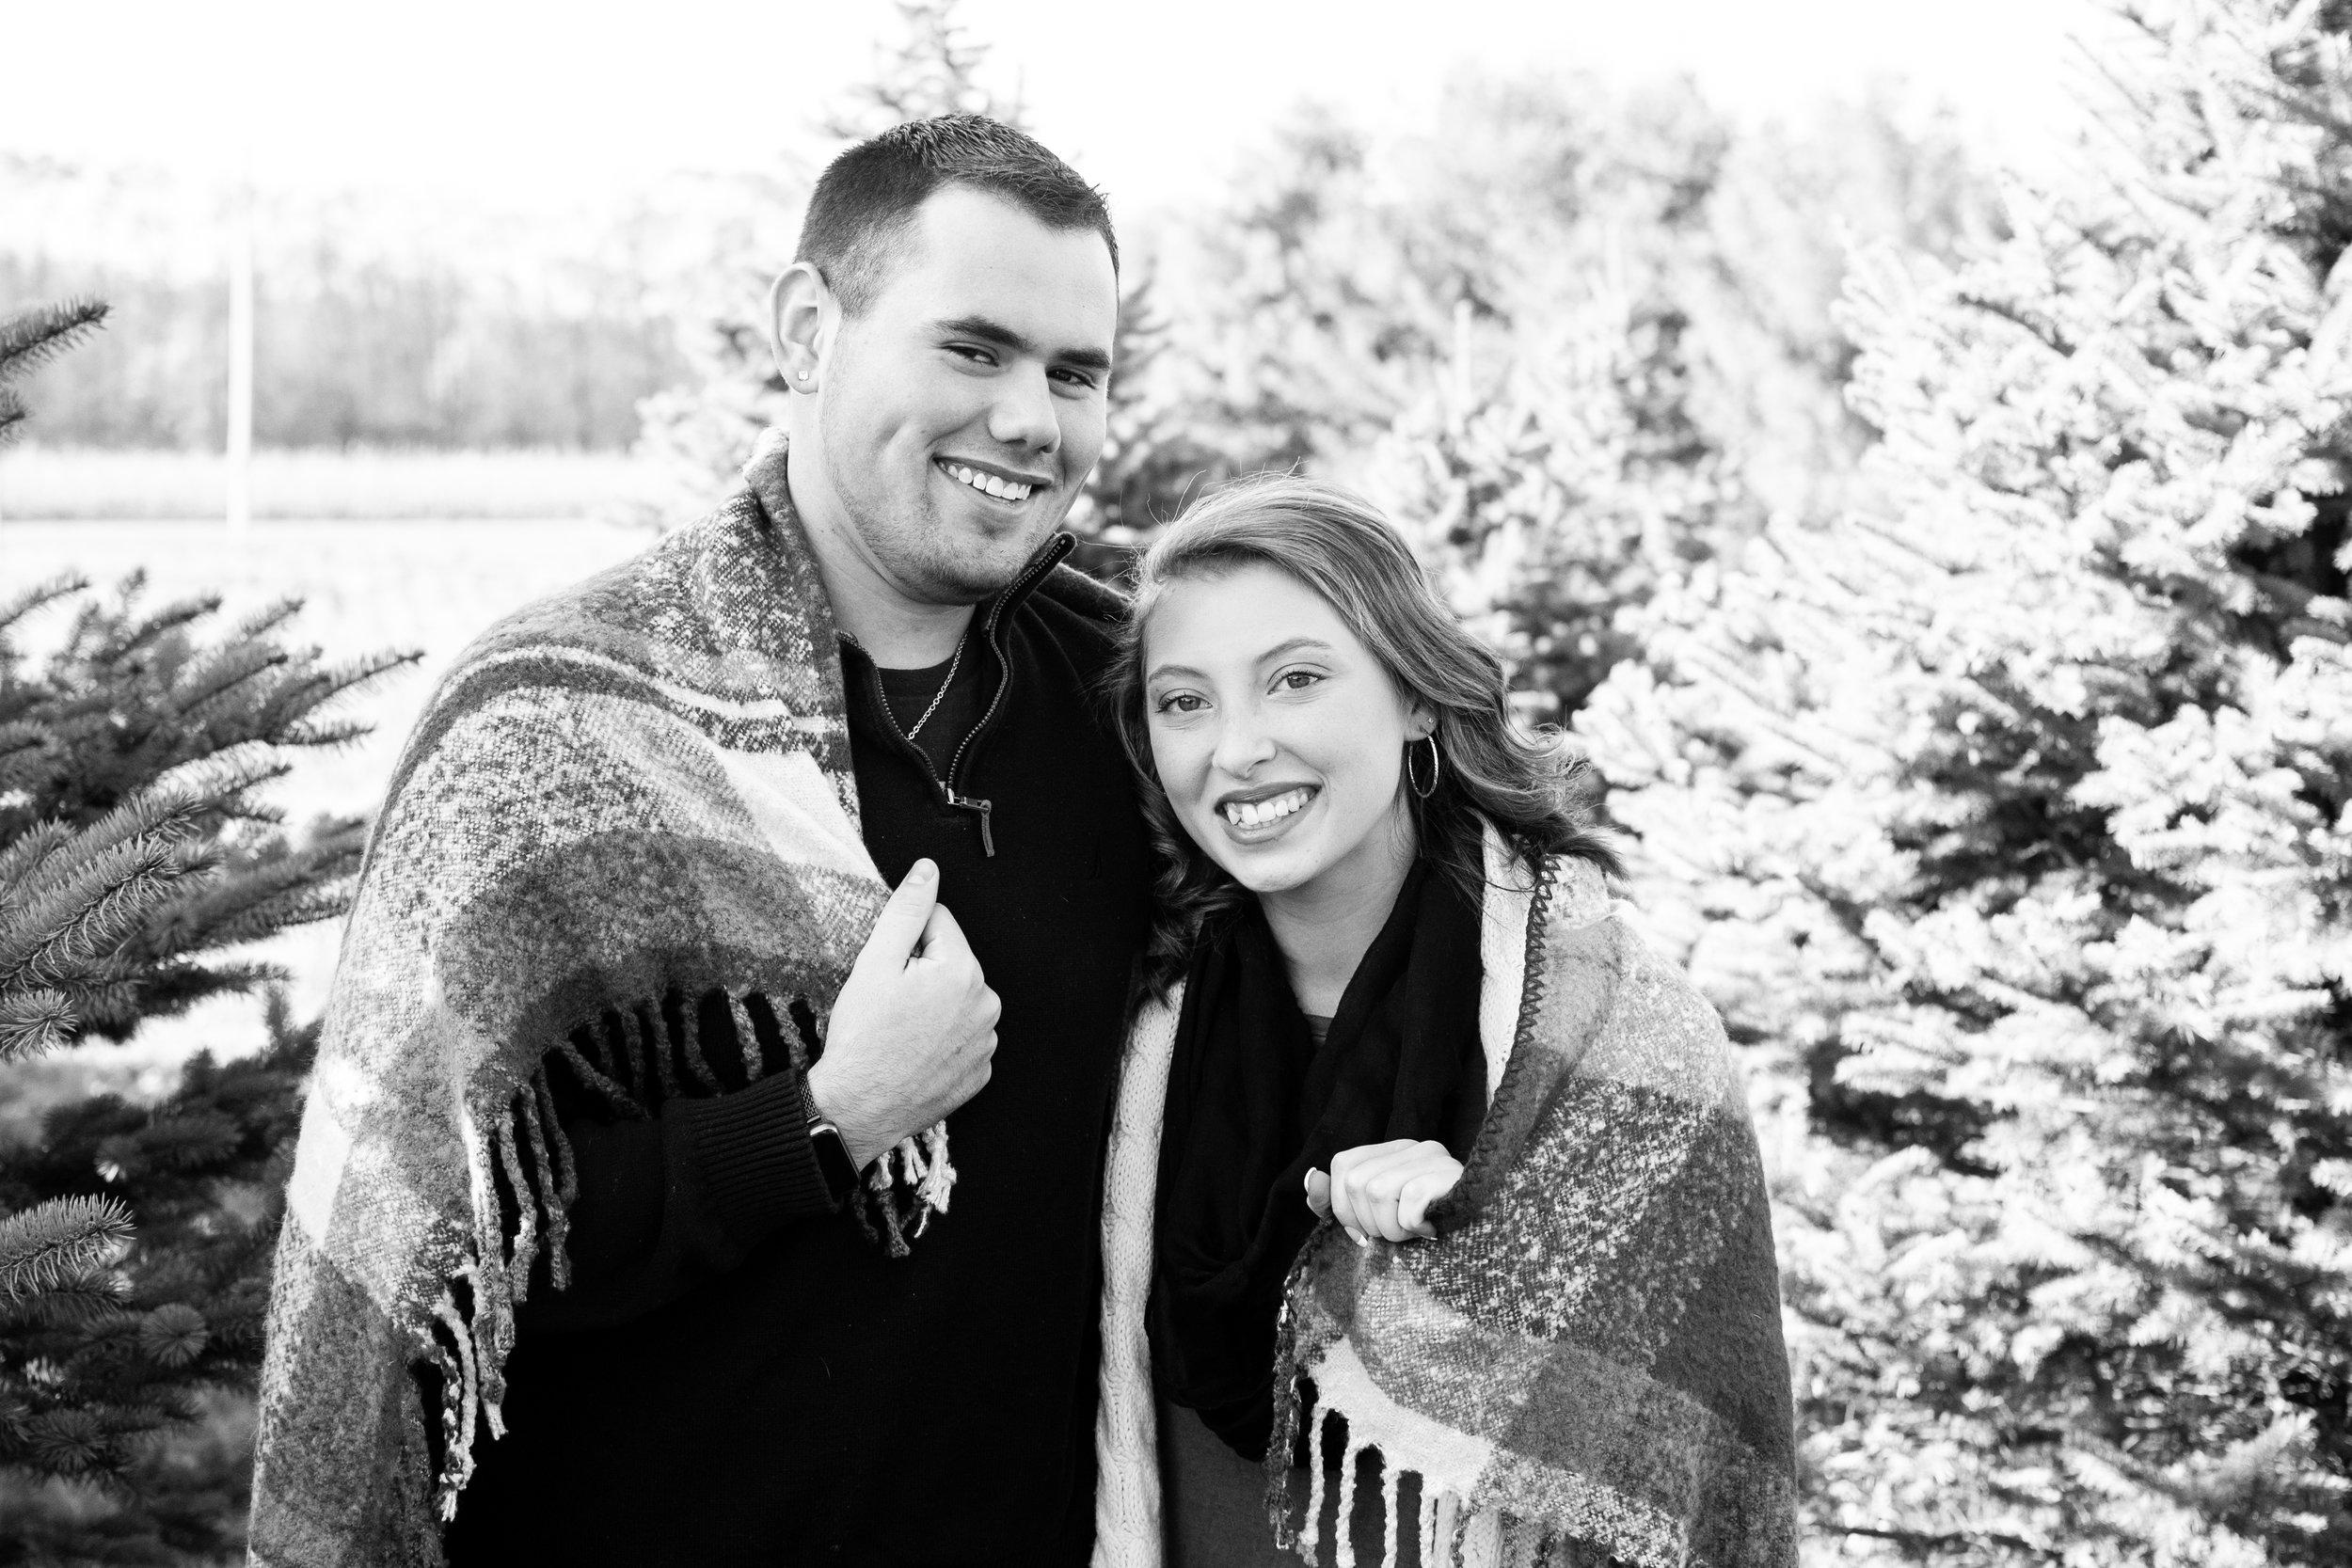 Kyla Jo Photography Muncie Indiana Photographer couple anniversary photography at Whitetail Tree Farm